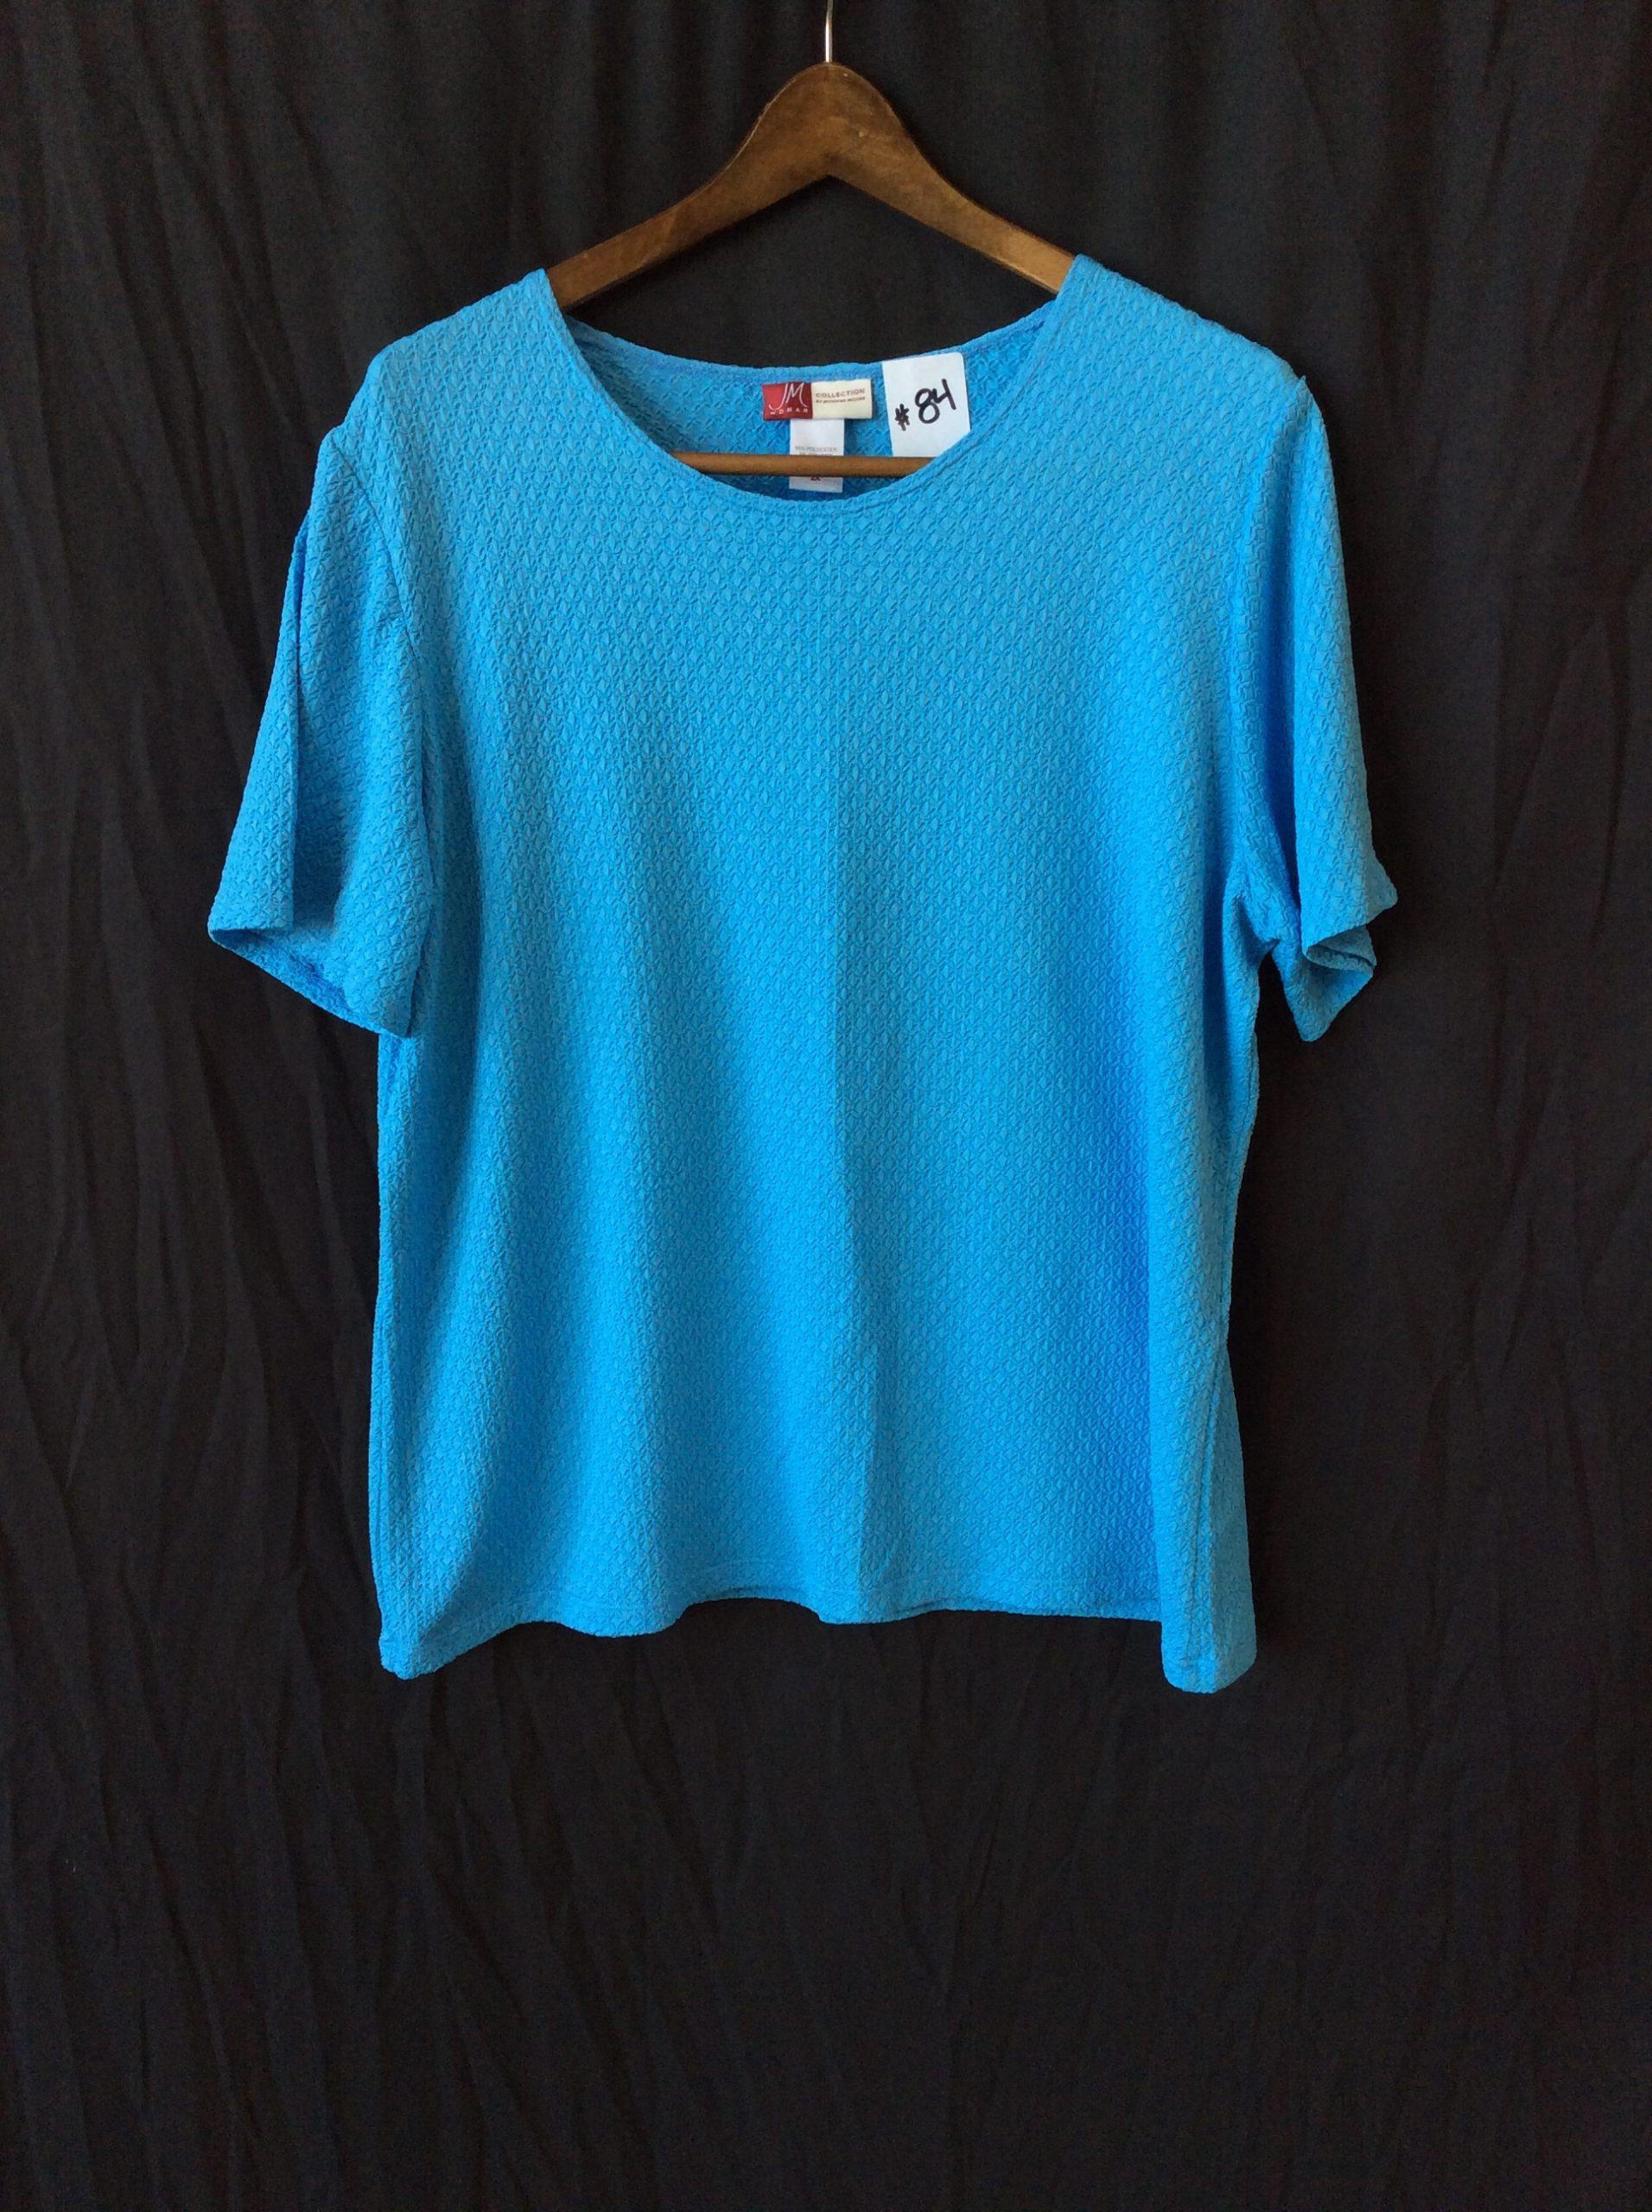 Women's blue knit top, size xl